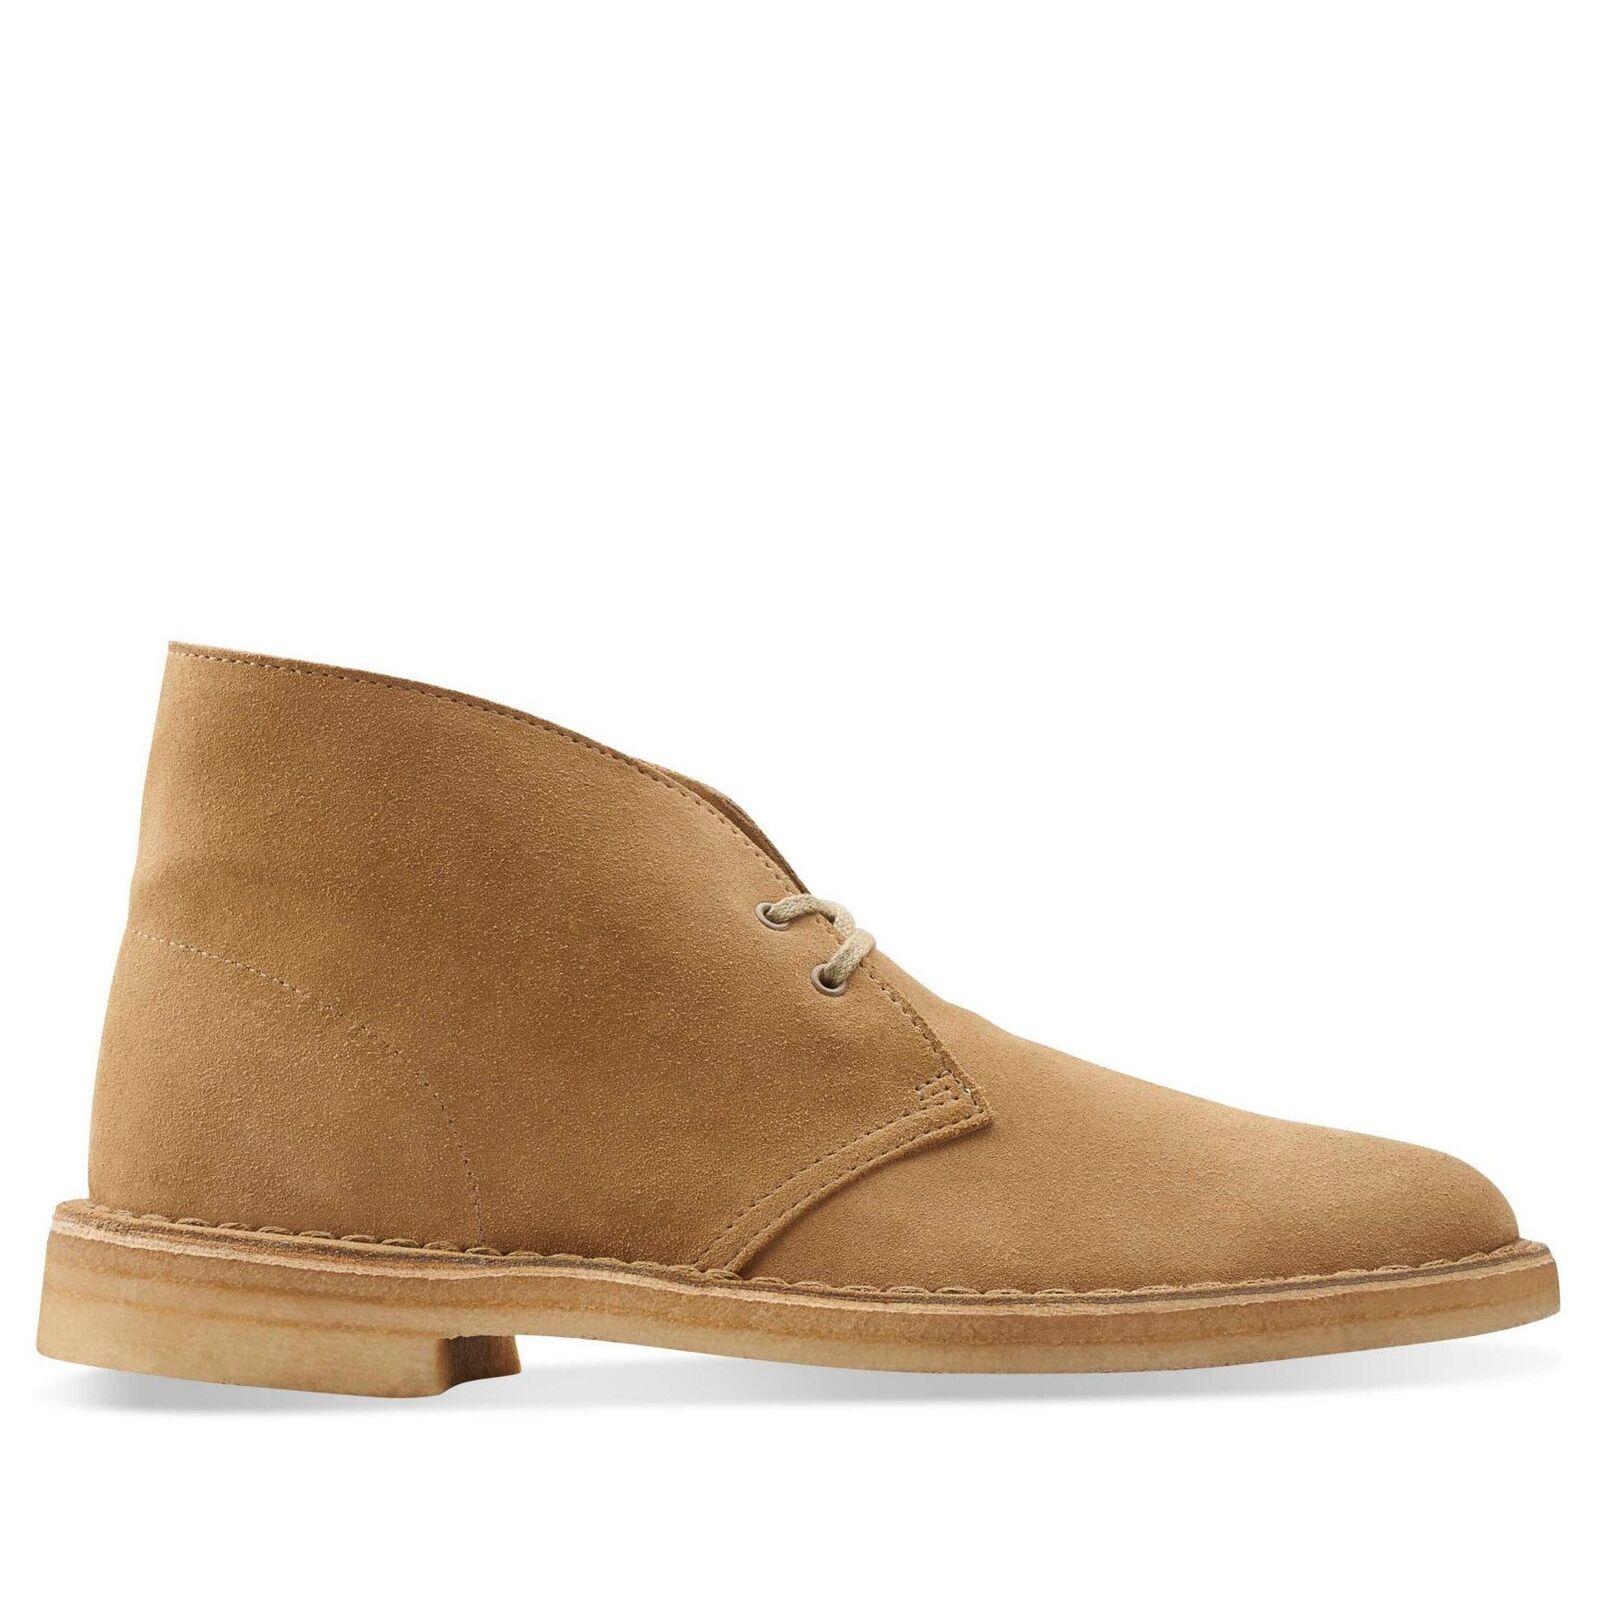 Clarks Mens Desert Boots Oakwood Suede 26110058 10 For Sale Online